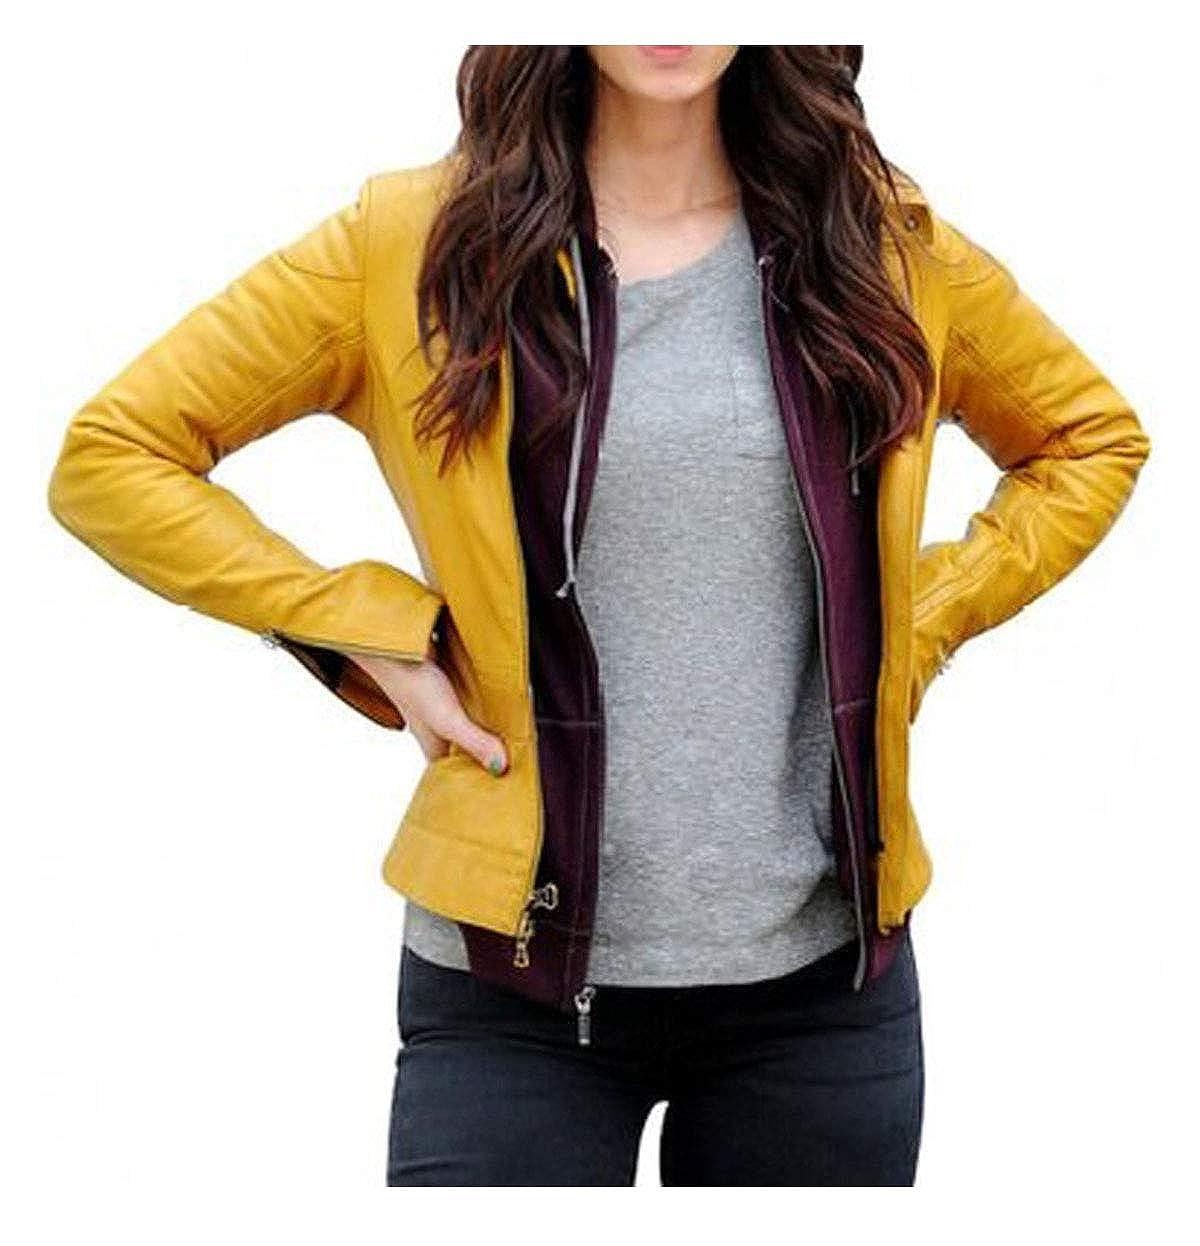 Amazon.com: Teenage Mutant Ninja Turtles Megan Fox Yellow ...